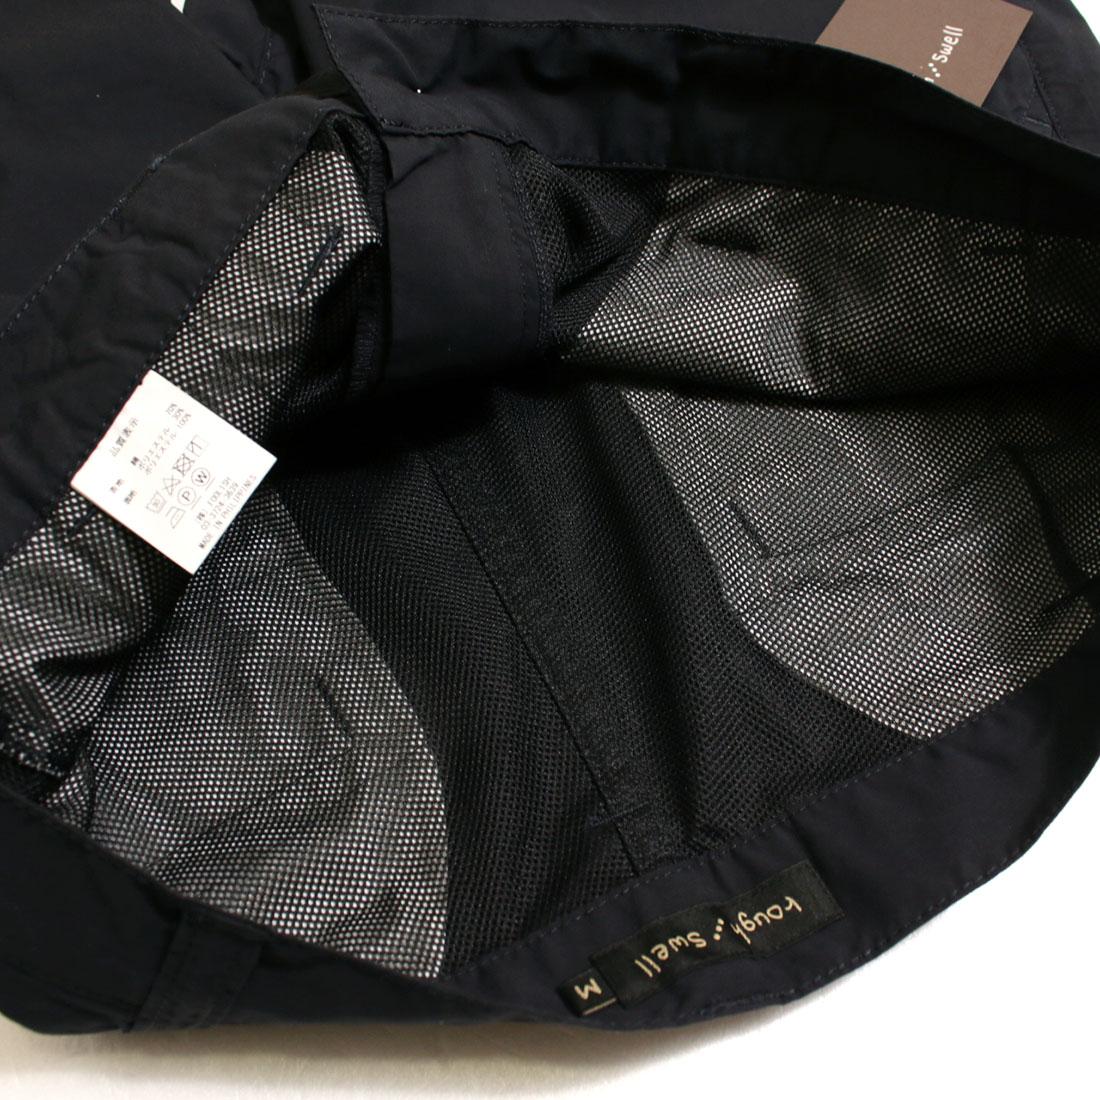 rough&swell ラフ&スウェル 【送料無料】 CHICAGO SHORTS(M L XL)メール便不可 メンズ パンツ ボトムス RSM-19071